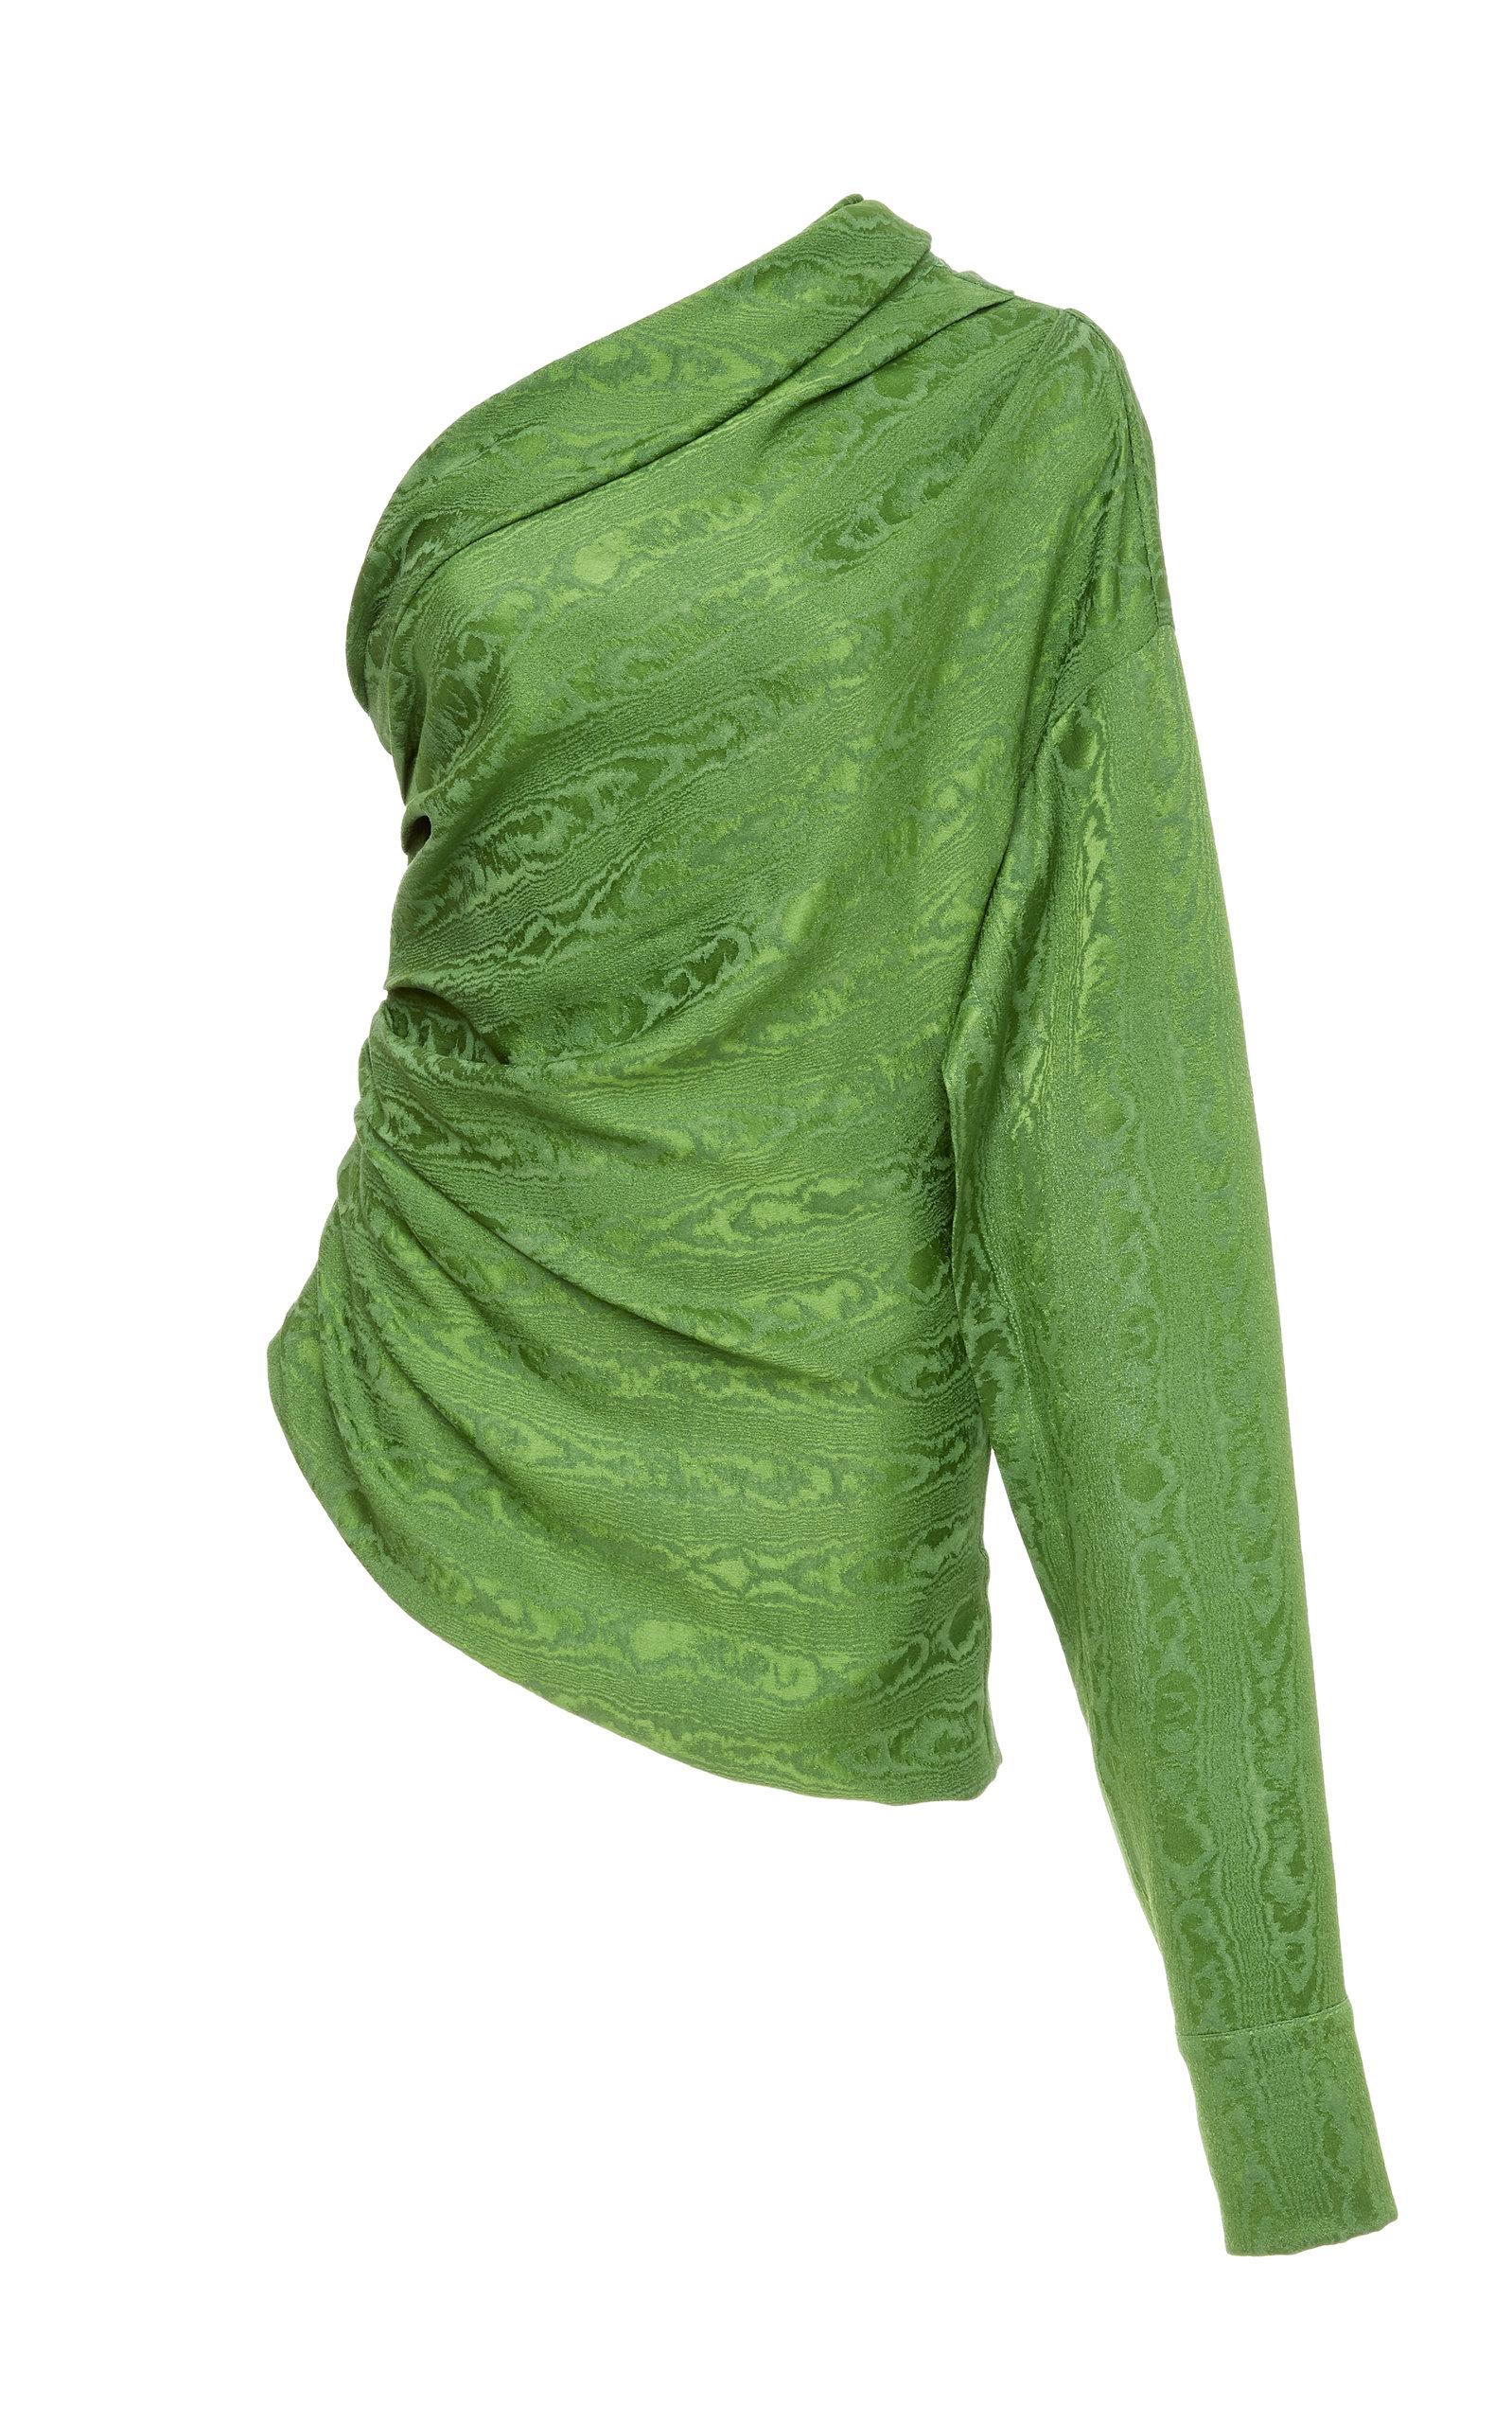 1751b47e376ae HellessyPaley One Shoulder Shirt. CLOSE. Loading